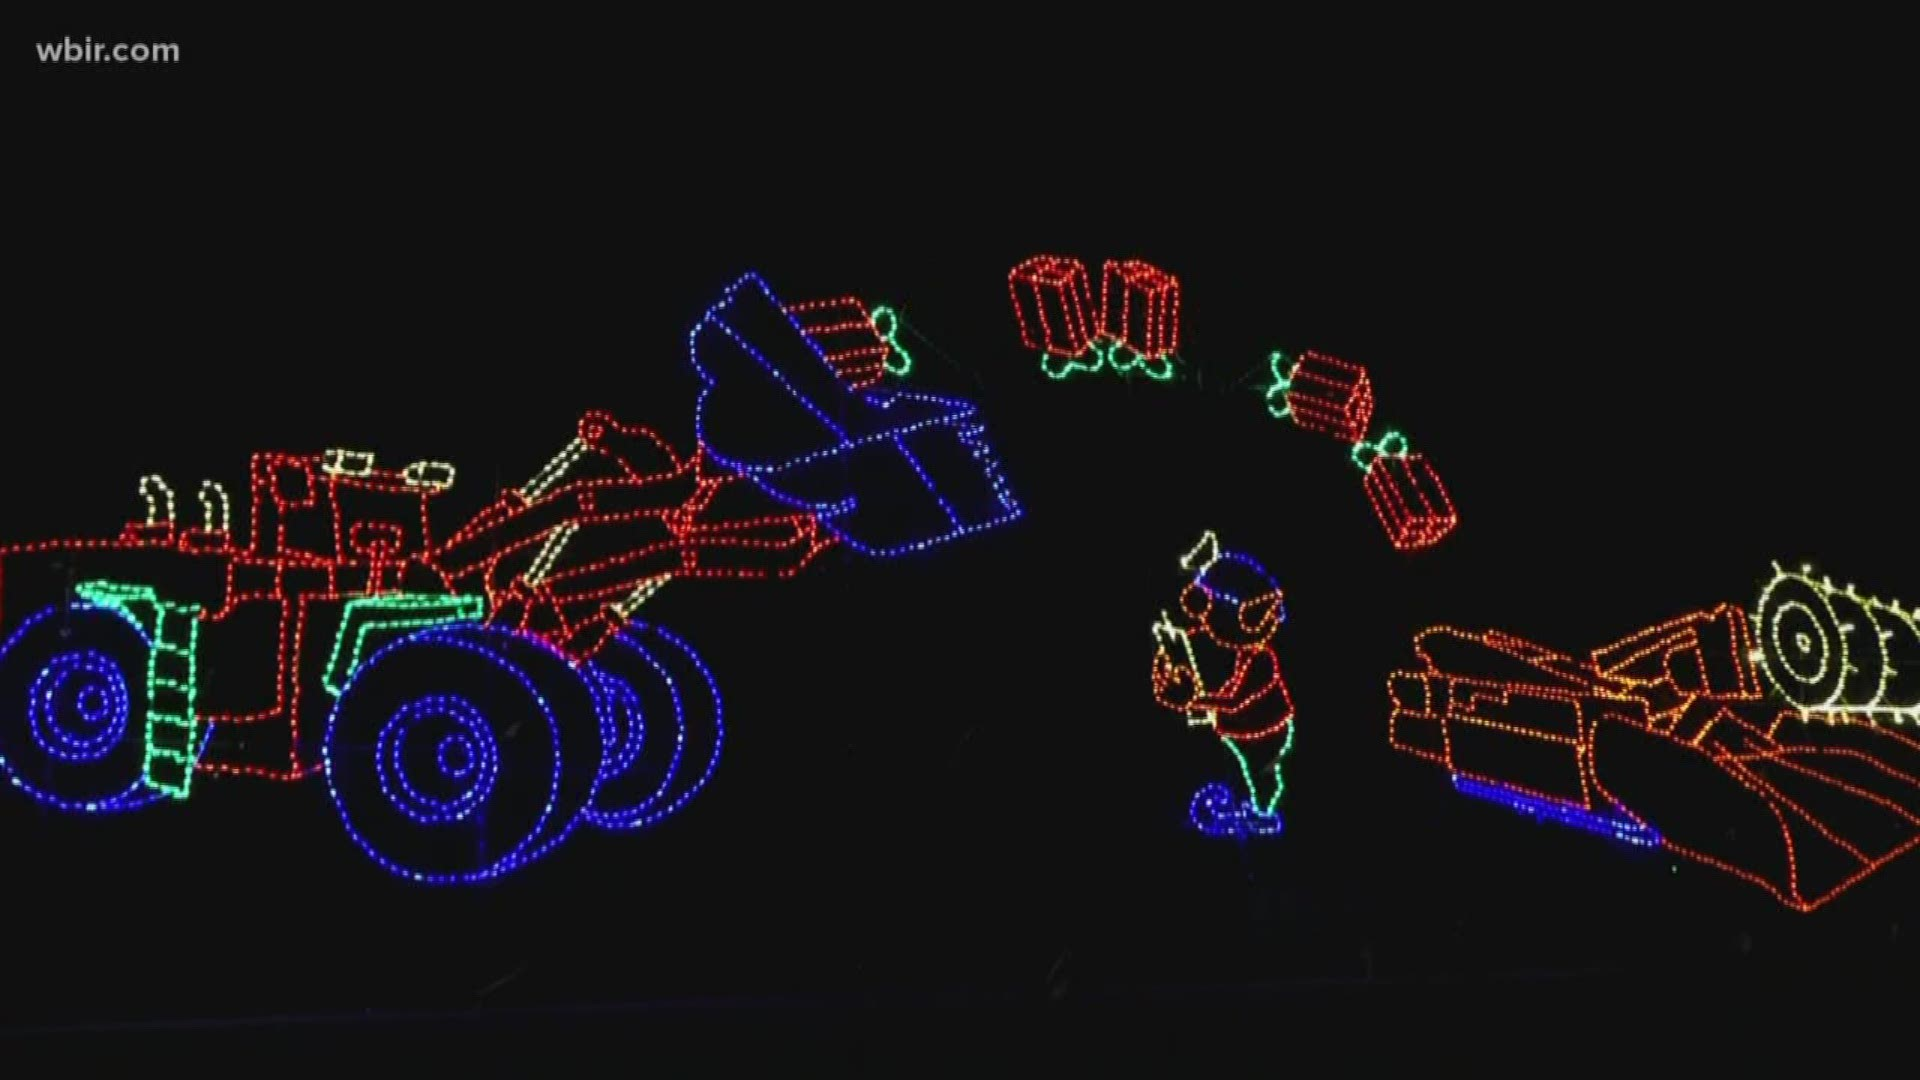 Bristol Motor Speedway Christmas Lights 2020 Check out the lights at Bristol Motor Speedway! | wbir.com